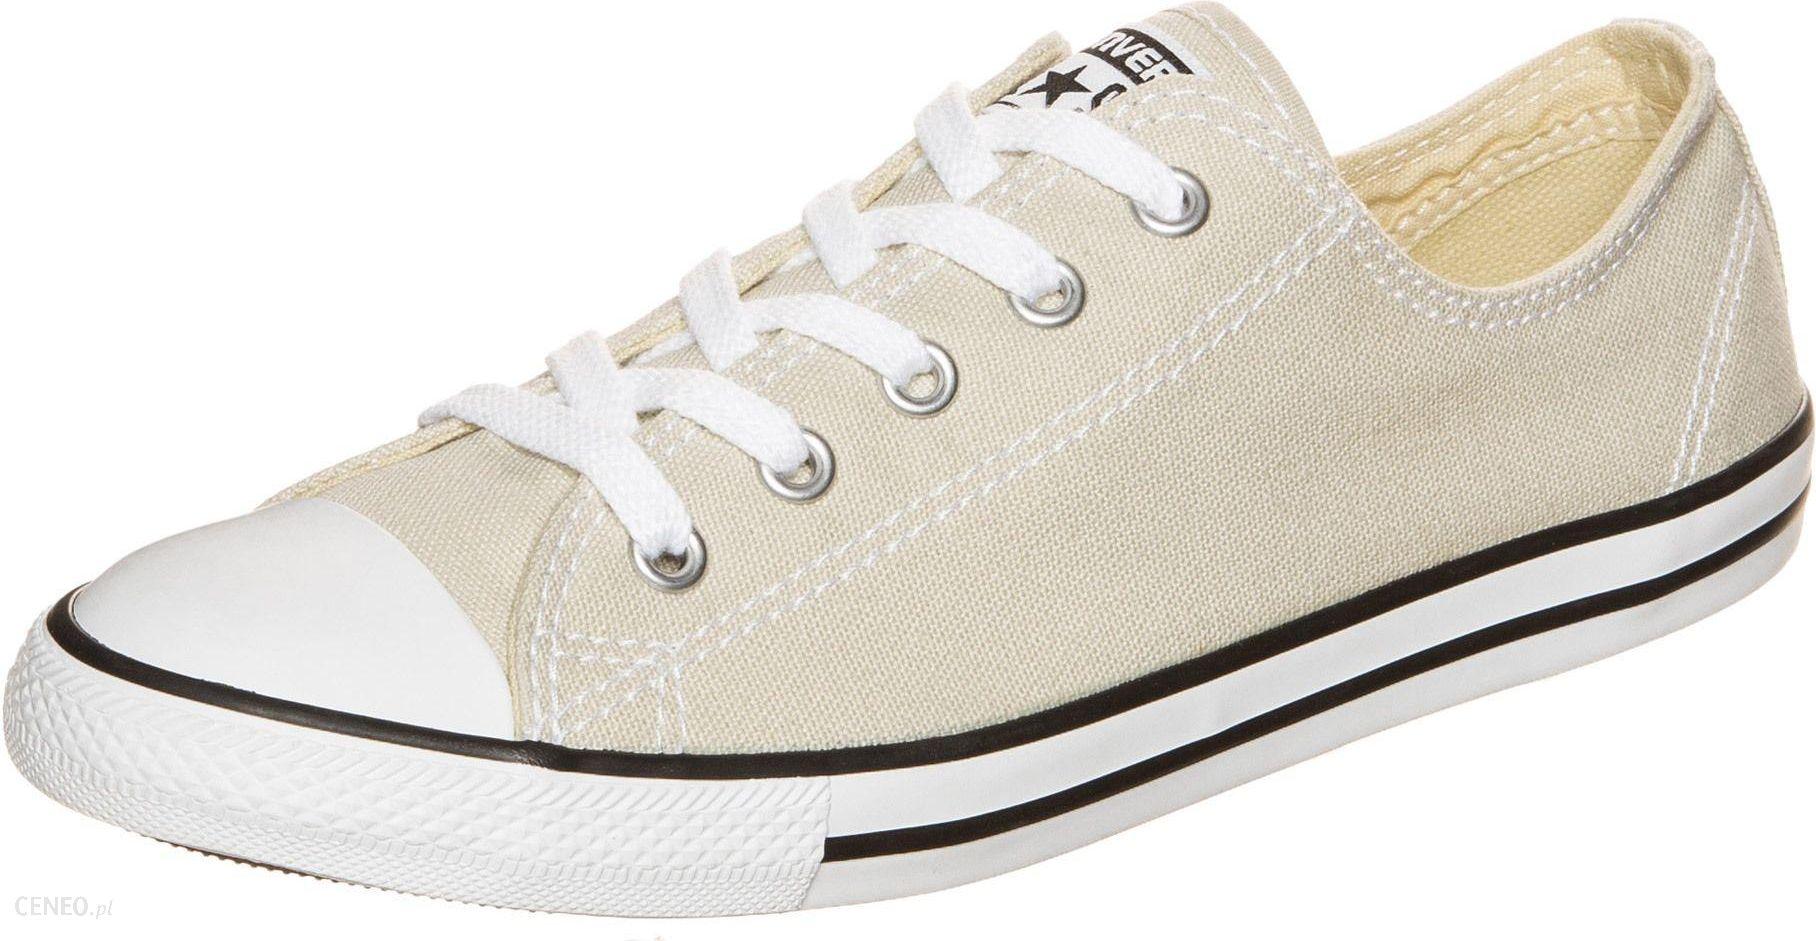 7b6416175f1c5c Converse Chuck Taylor All Star Dainty Seashell 39